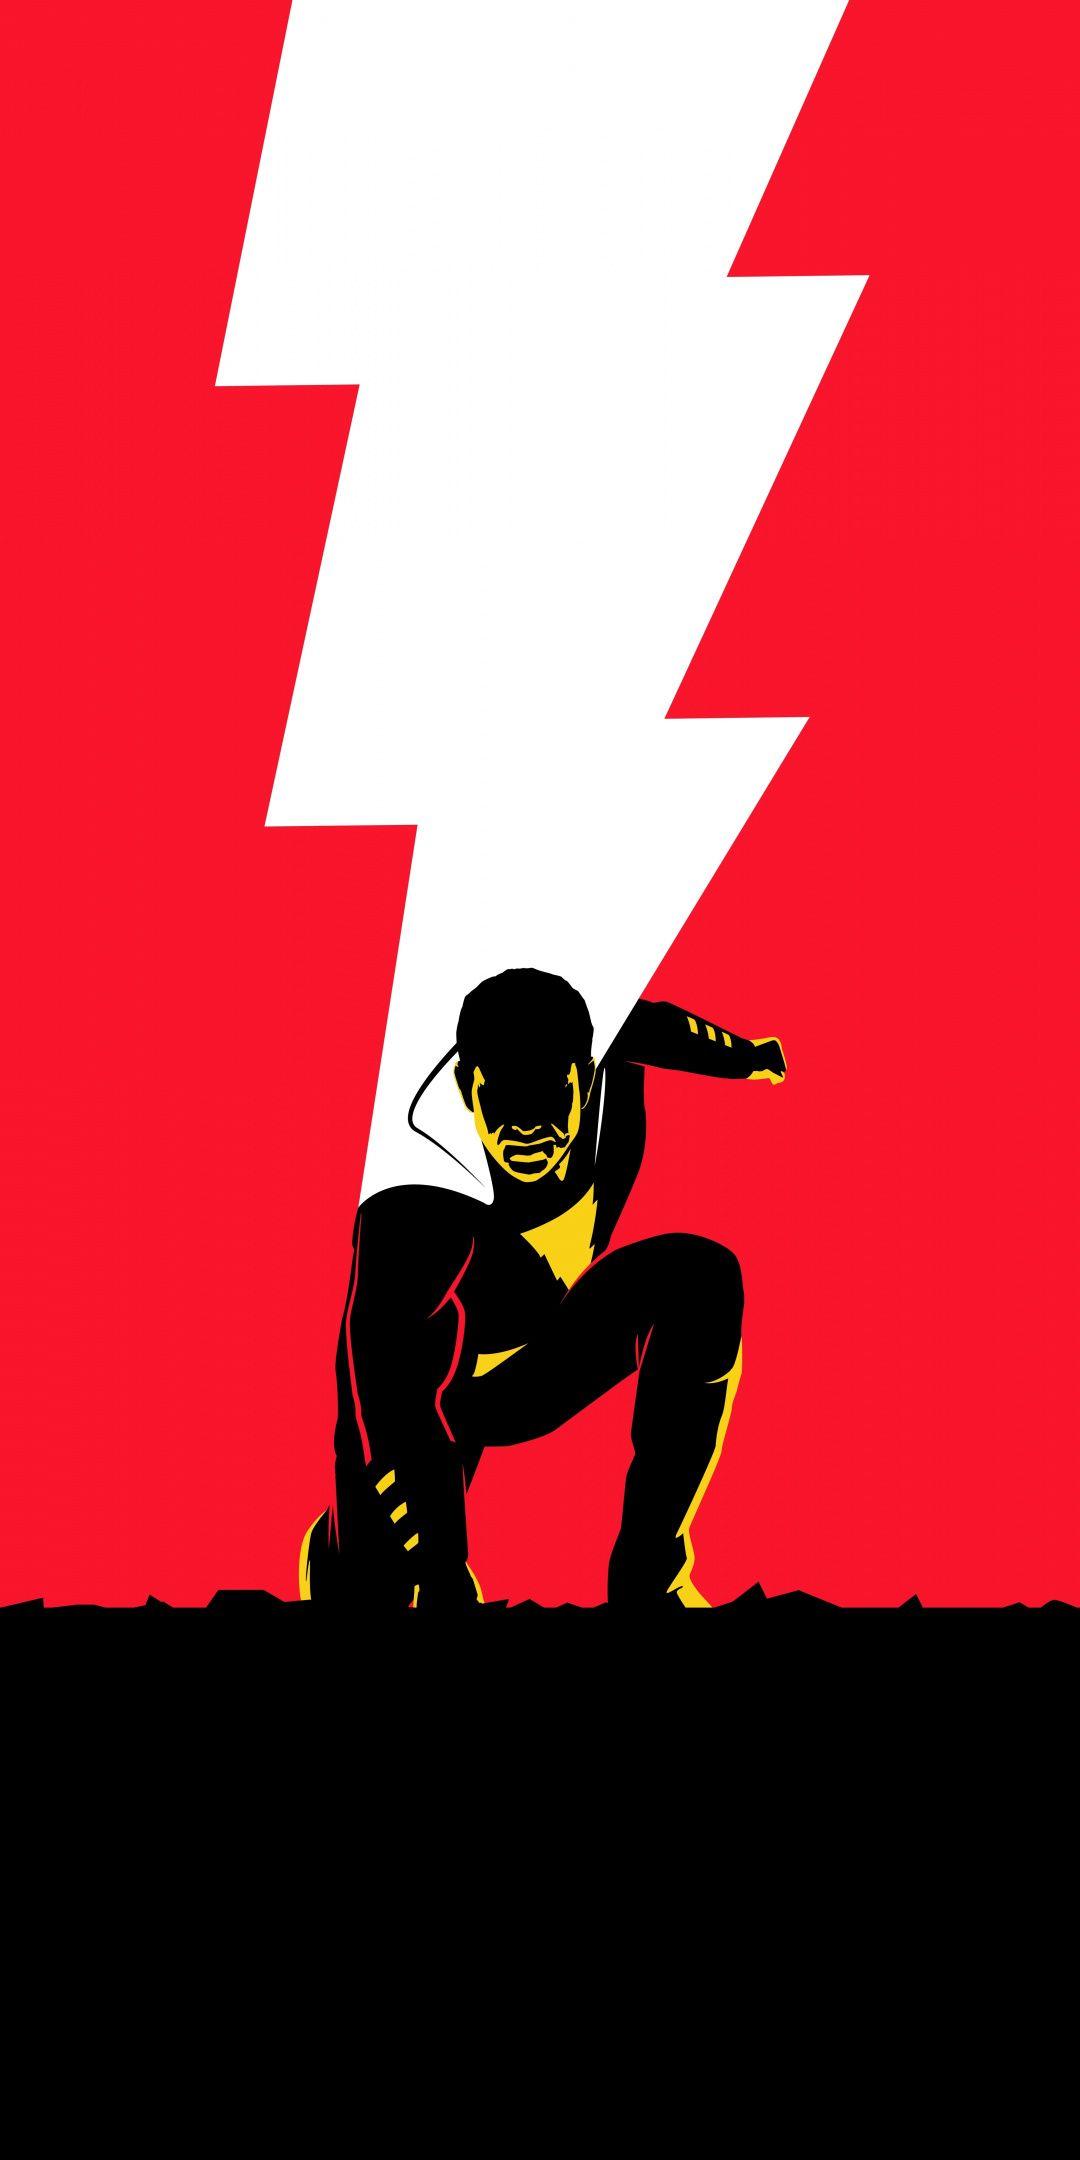 Shazam!, movie, minimal, poster, 1080x2160 wallpaper